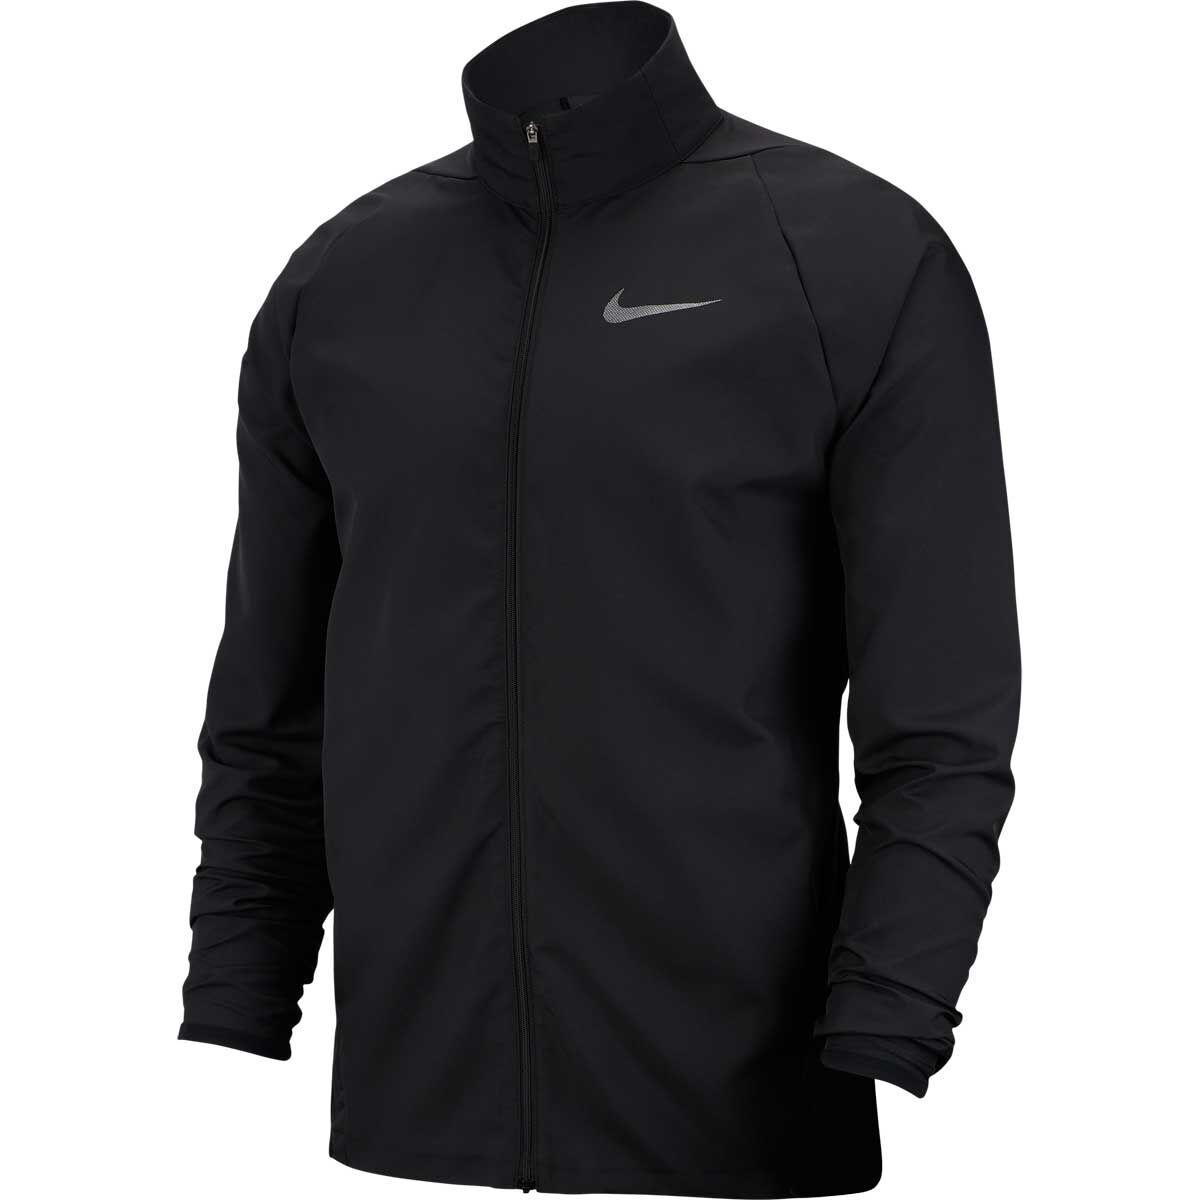 Nike Mens Dry Woven Training Jacket Black L